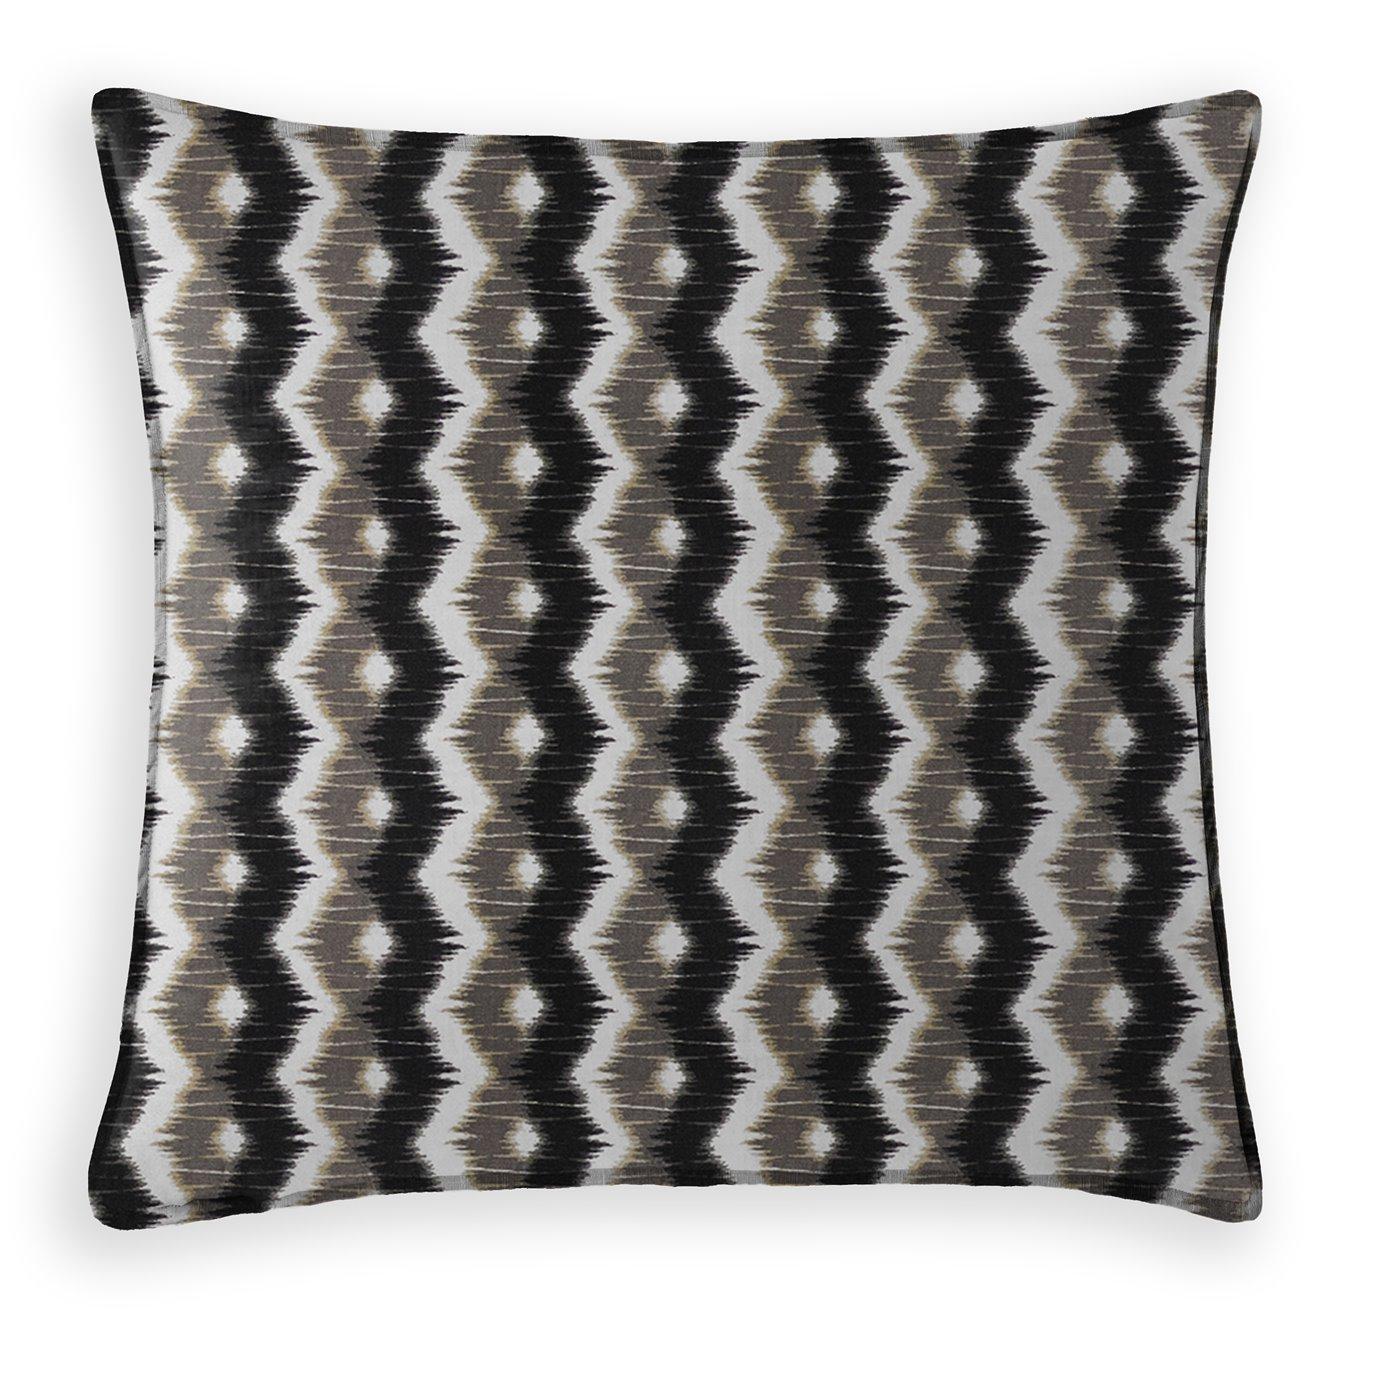 Nelson Decorative Cushion - 20 Inch Square - Coordinating Velvet